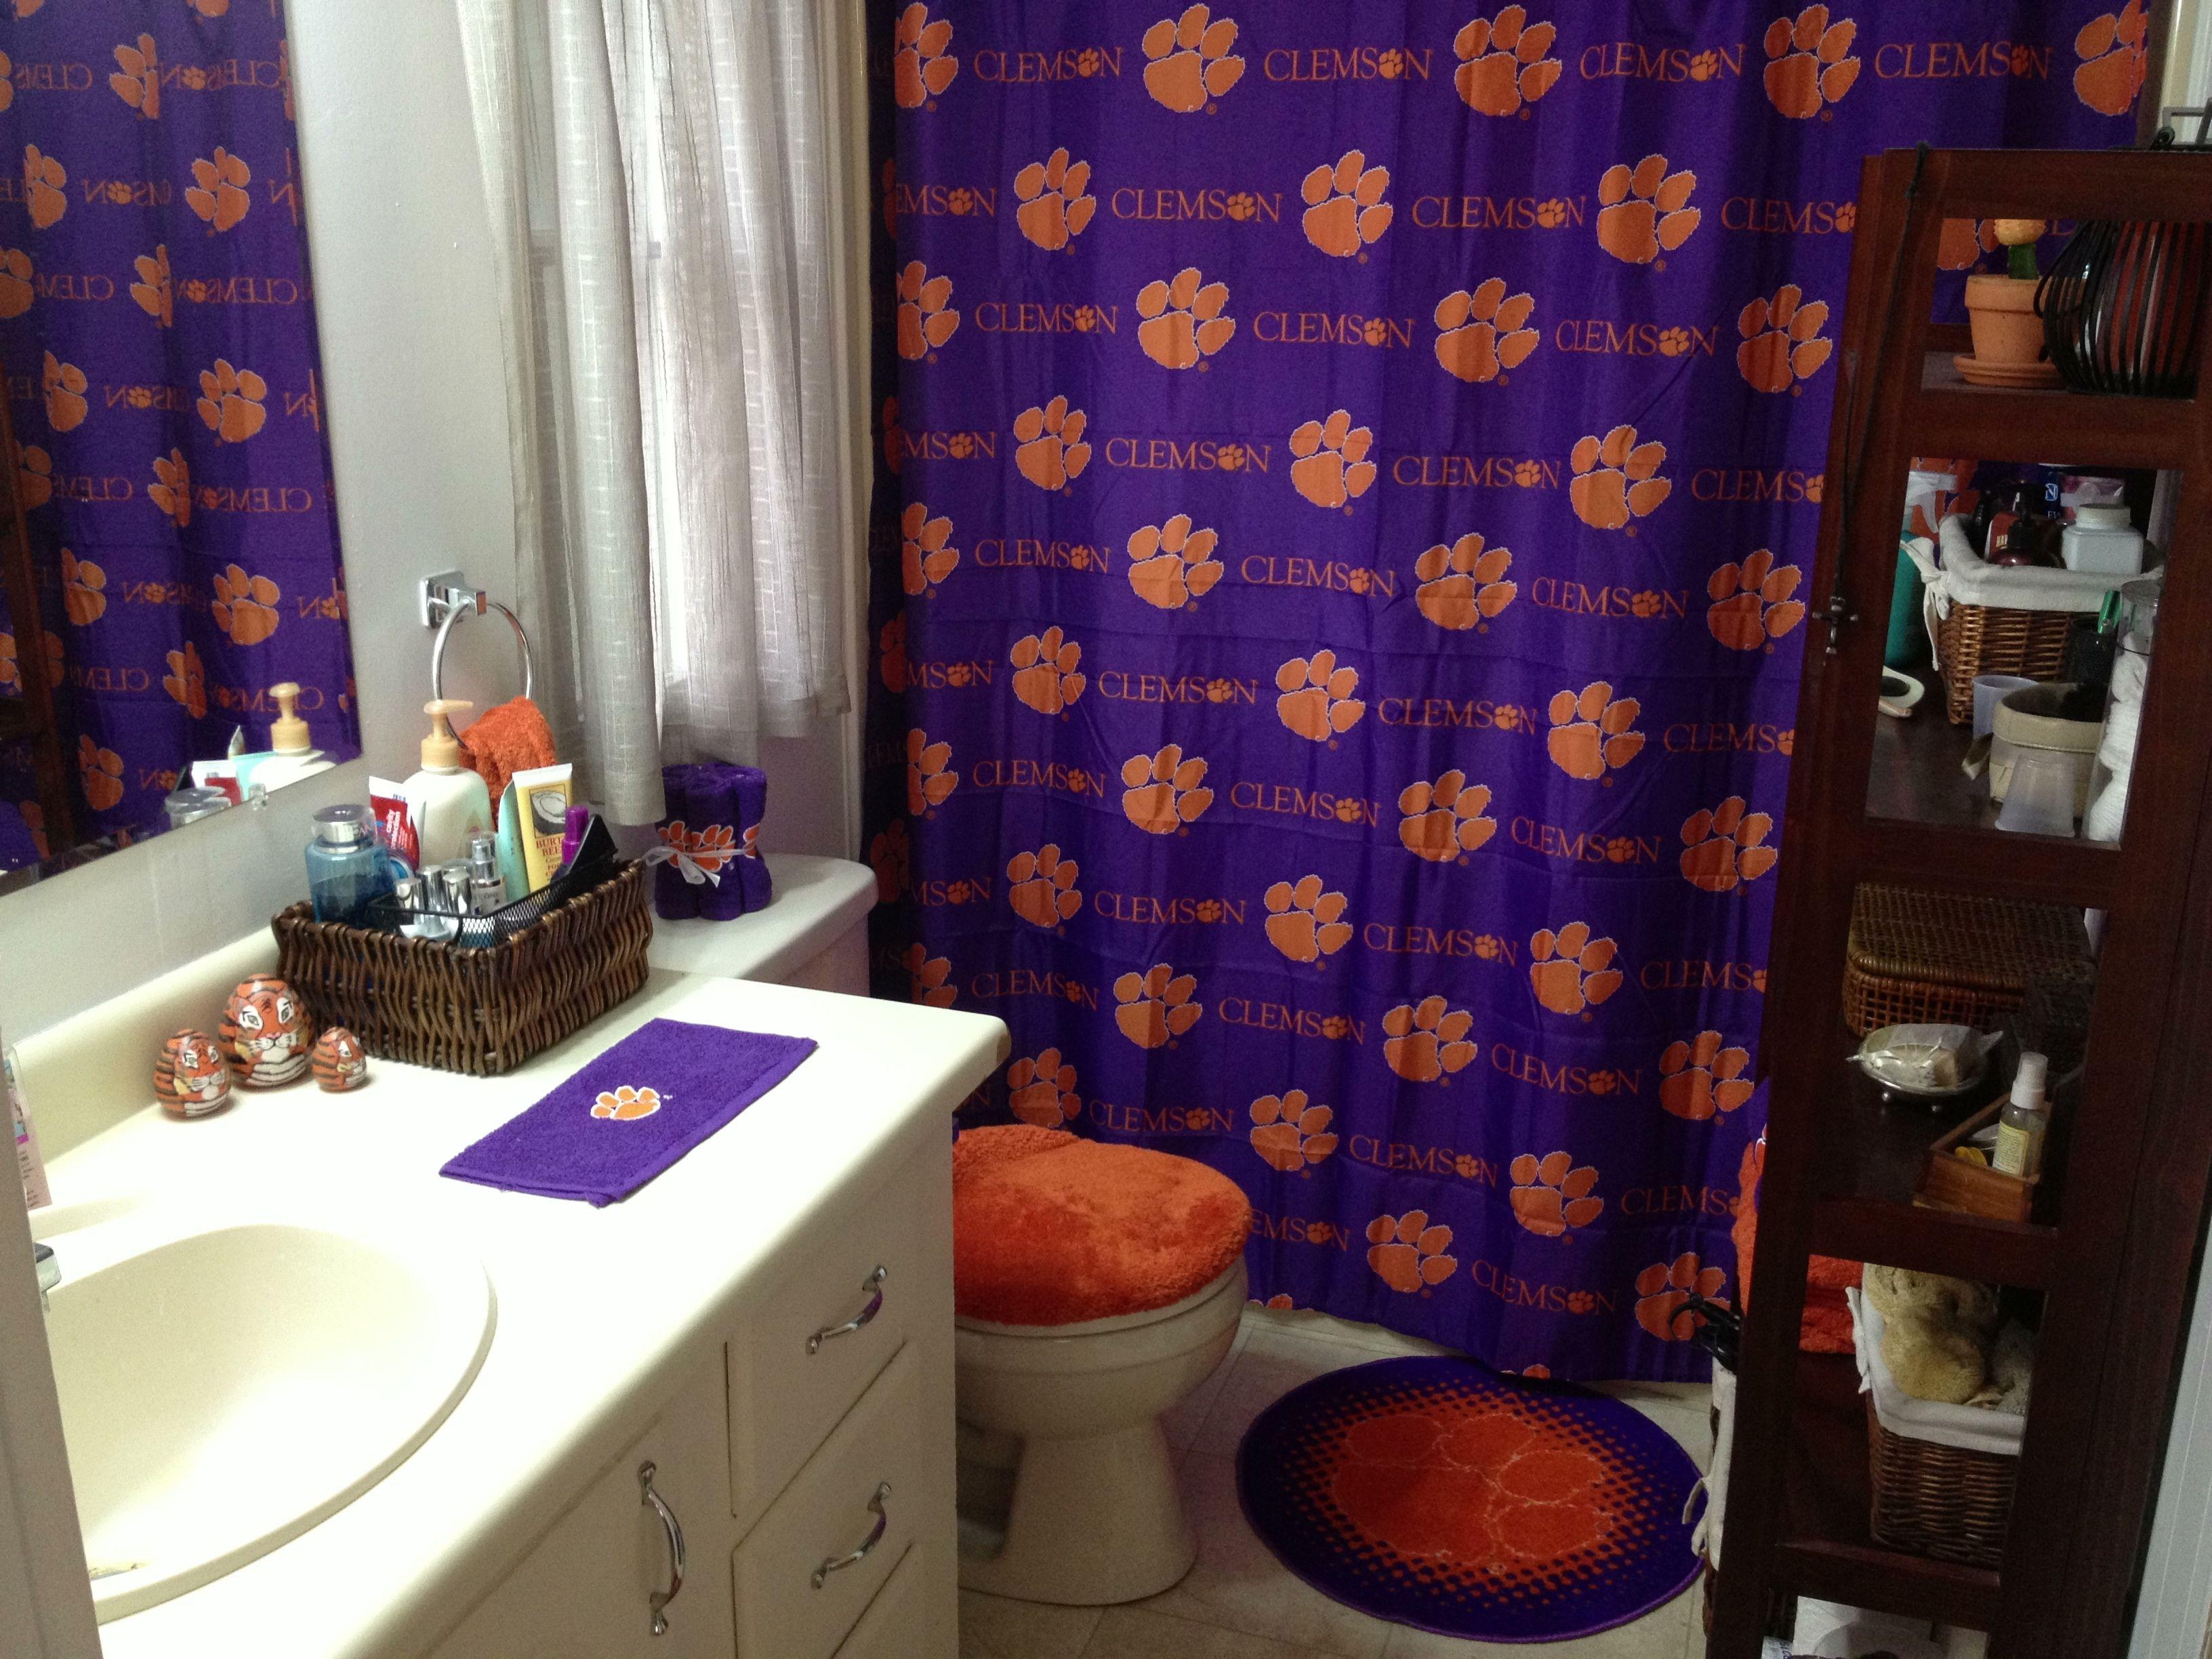 Superb Clemson Shower Curtain